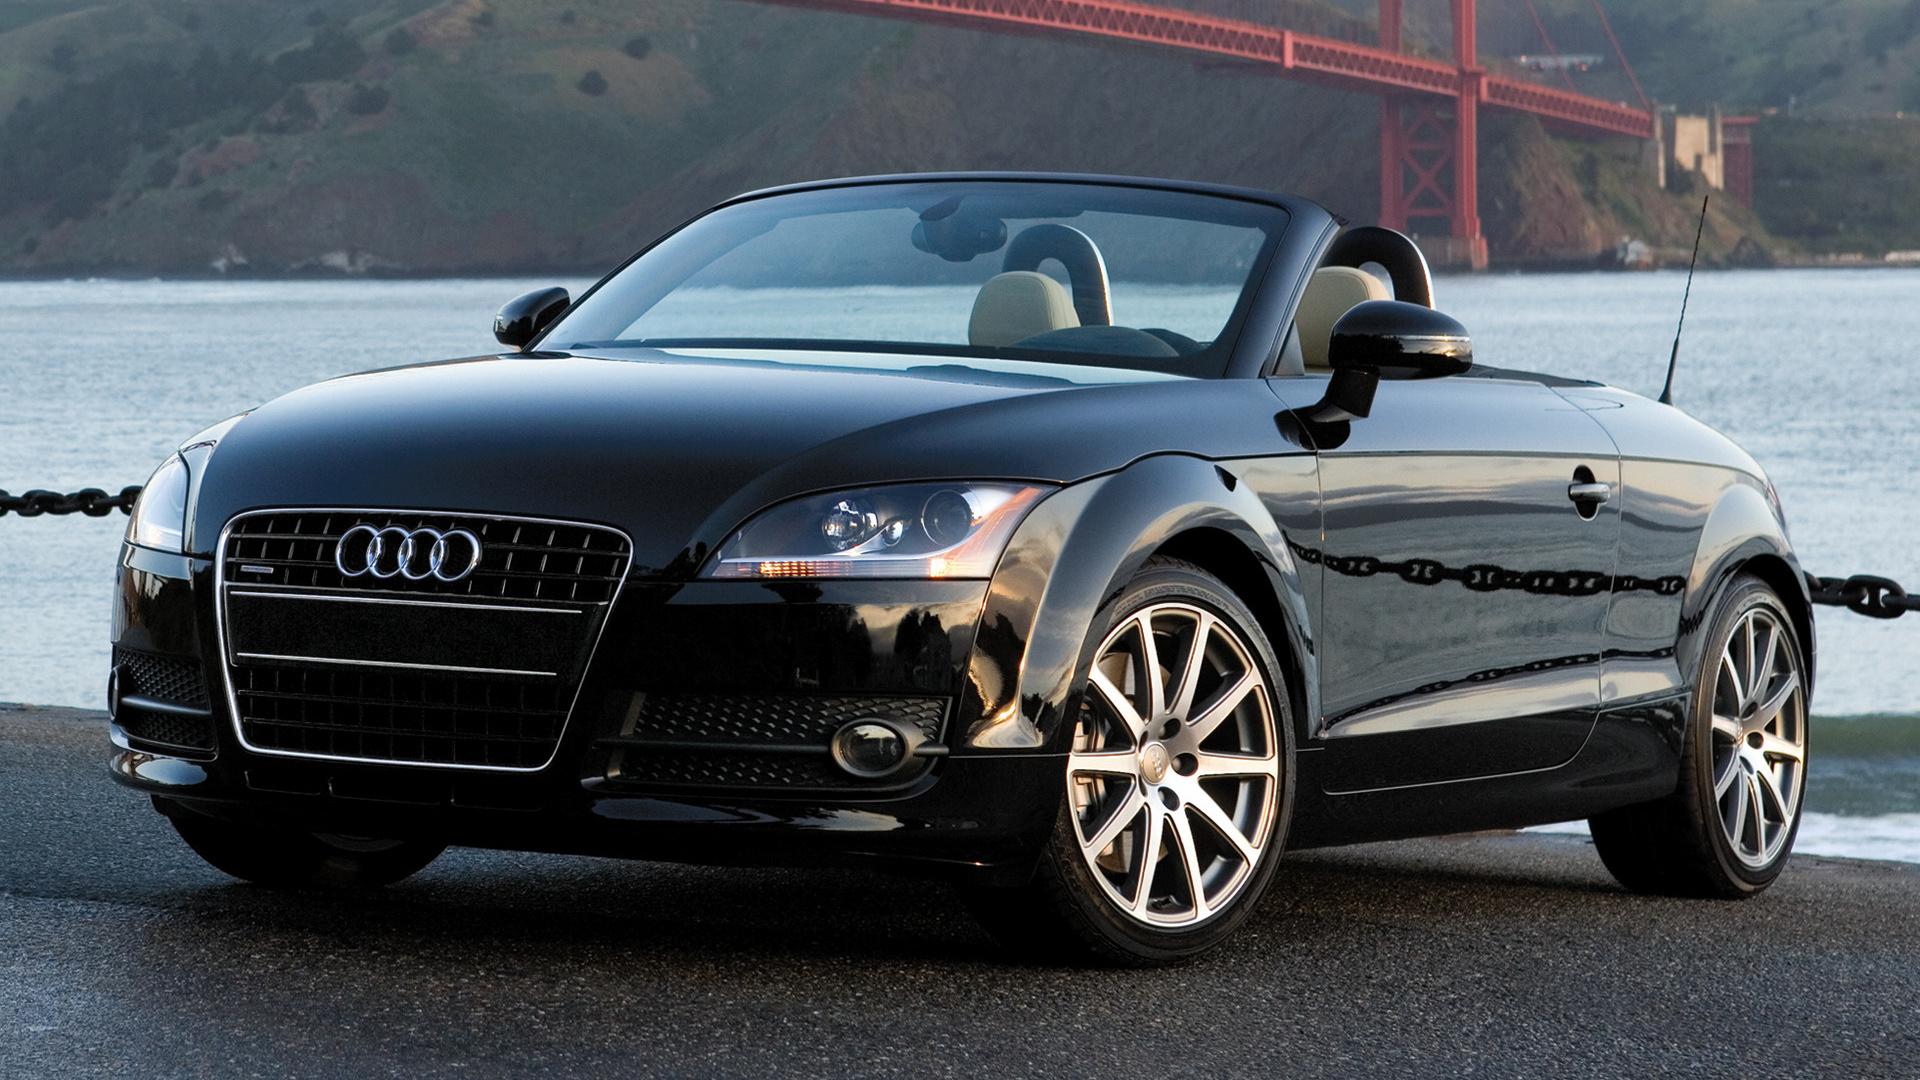 2008 Audi Tt Roadster Us Papeis De Parede E Imagens De Fundo Em Hd Car Pixel